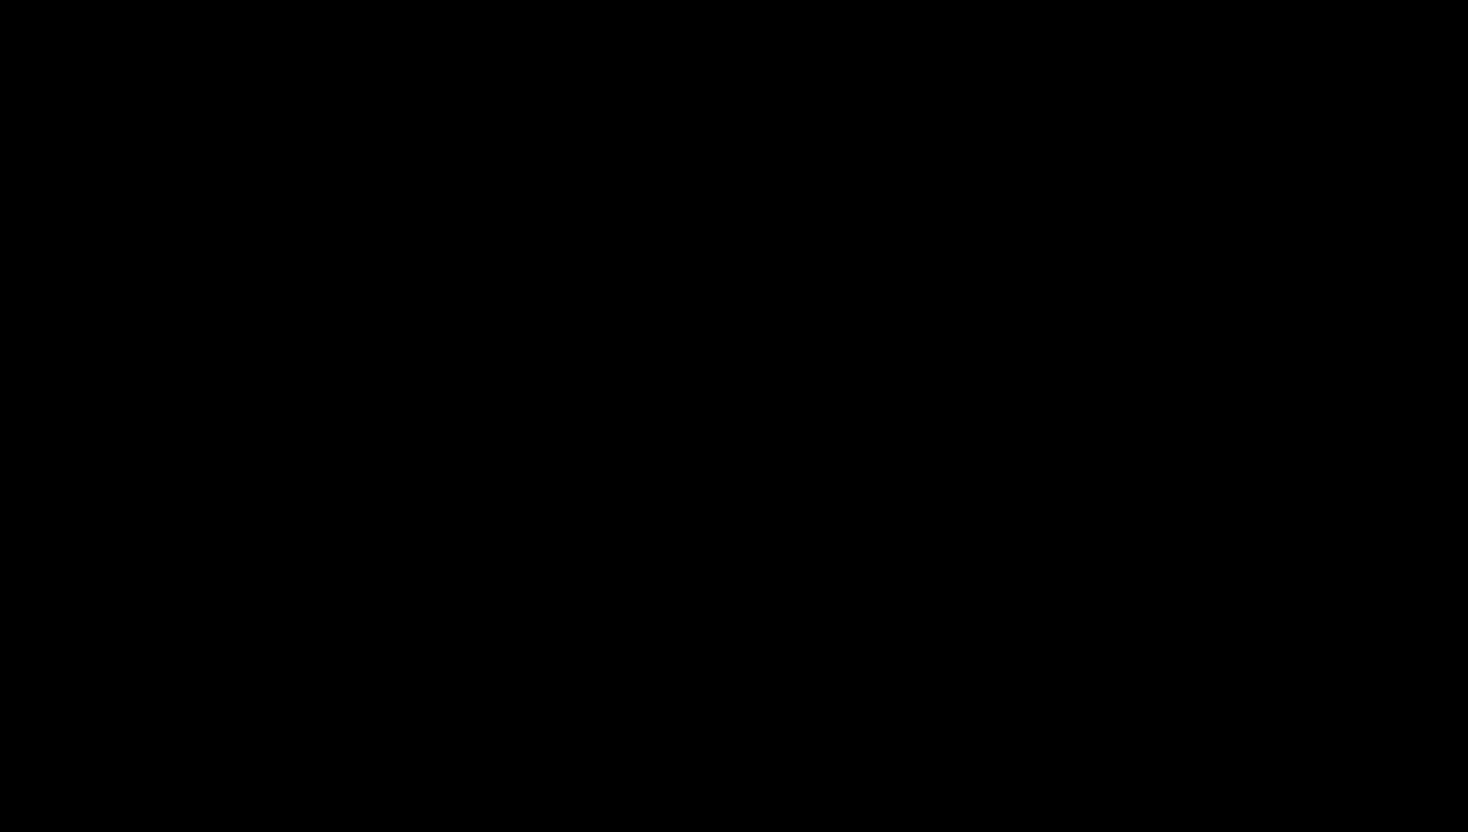 (E)-Dichlorodenafil